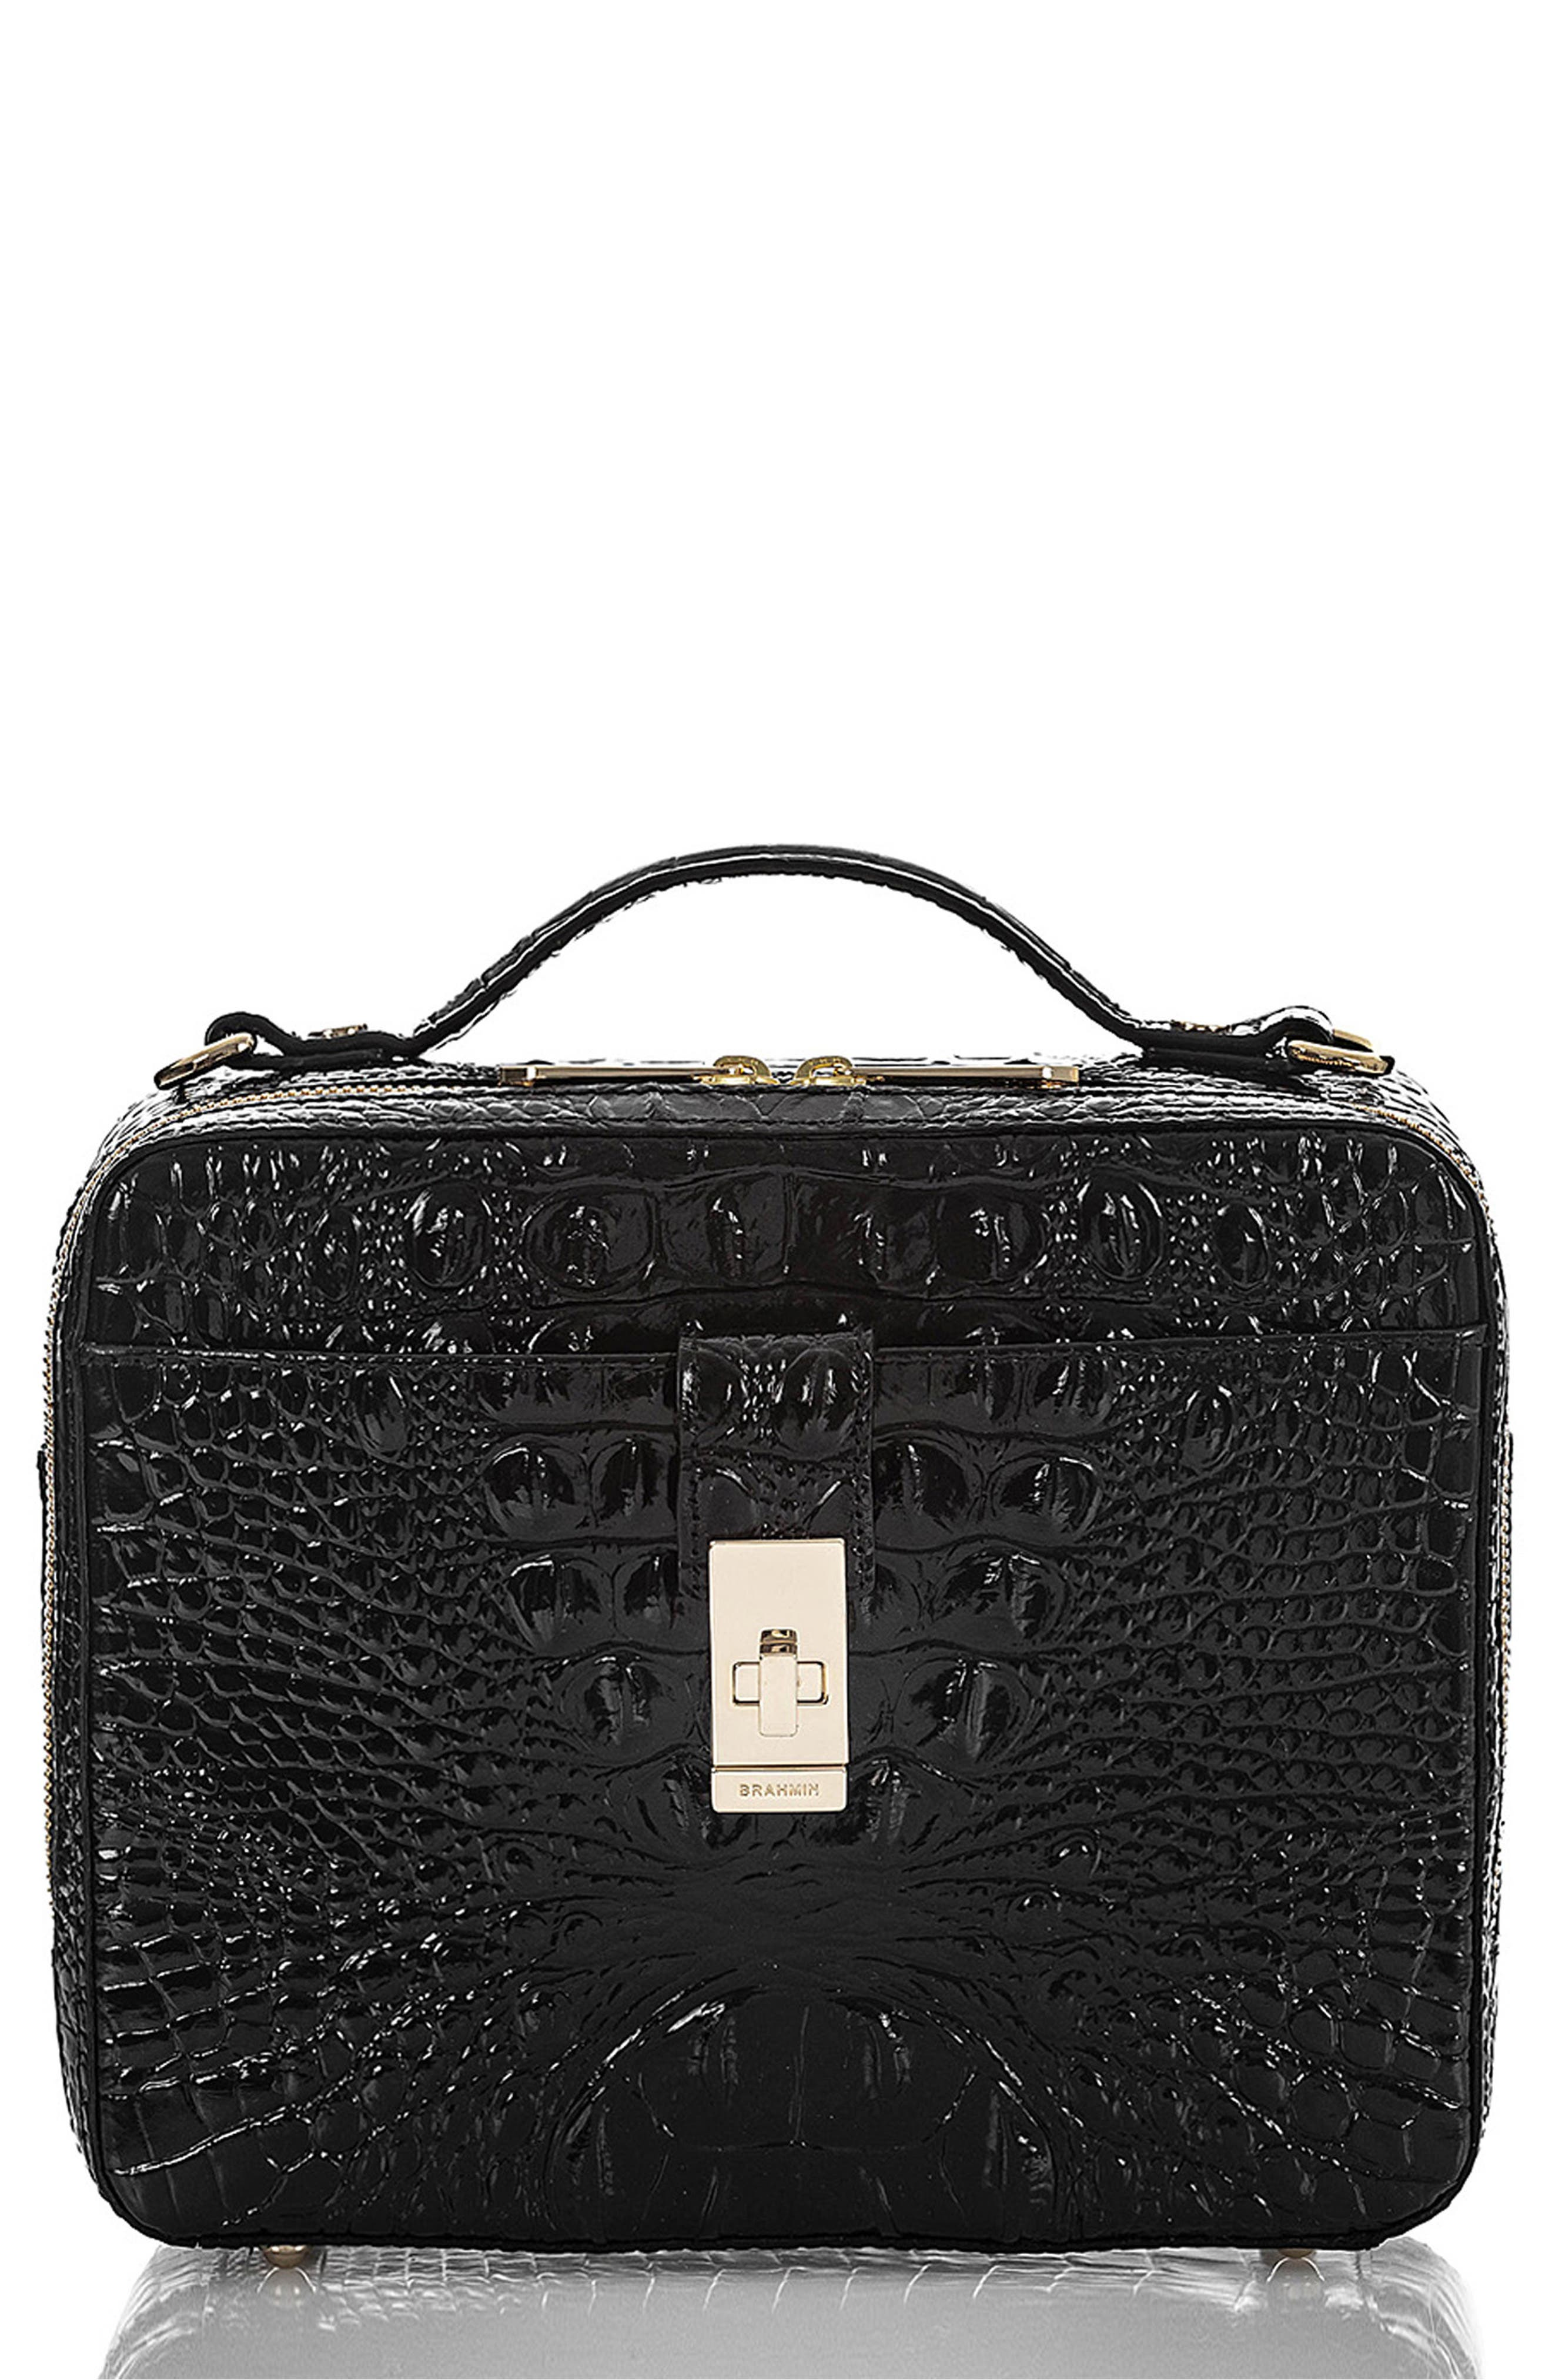 Evie Croc Embossed Leather Top Handle Bag,                             Main thumbnail 1, color,                             BLACK MEMBOURNE